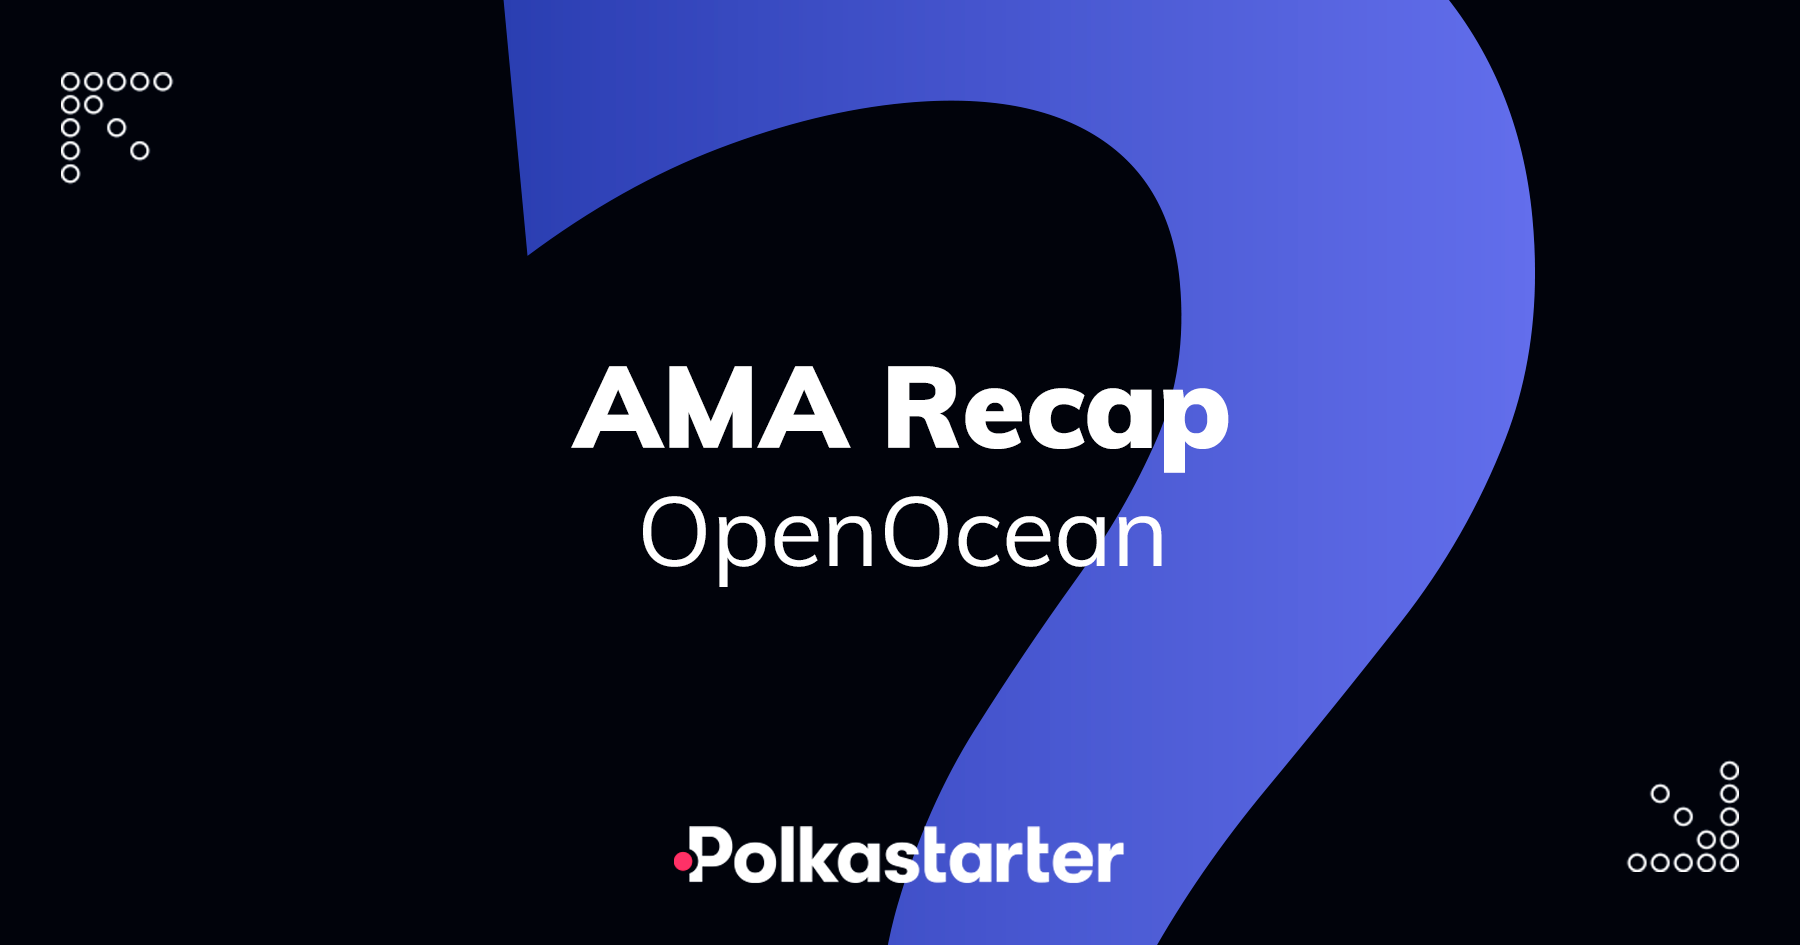 [PolkaStarter] Polkastarter and OpenOcean AMA Recap - AZCoin News